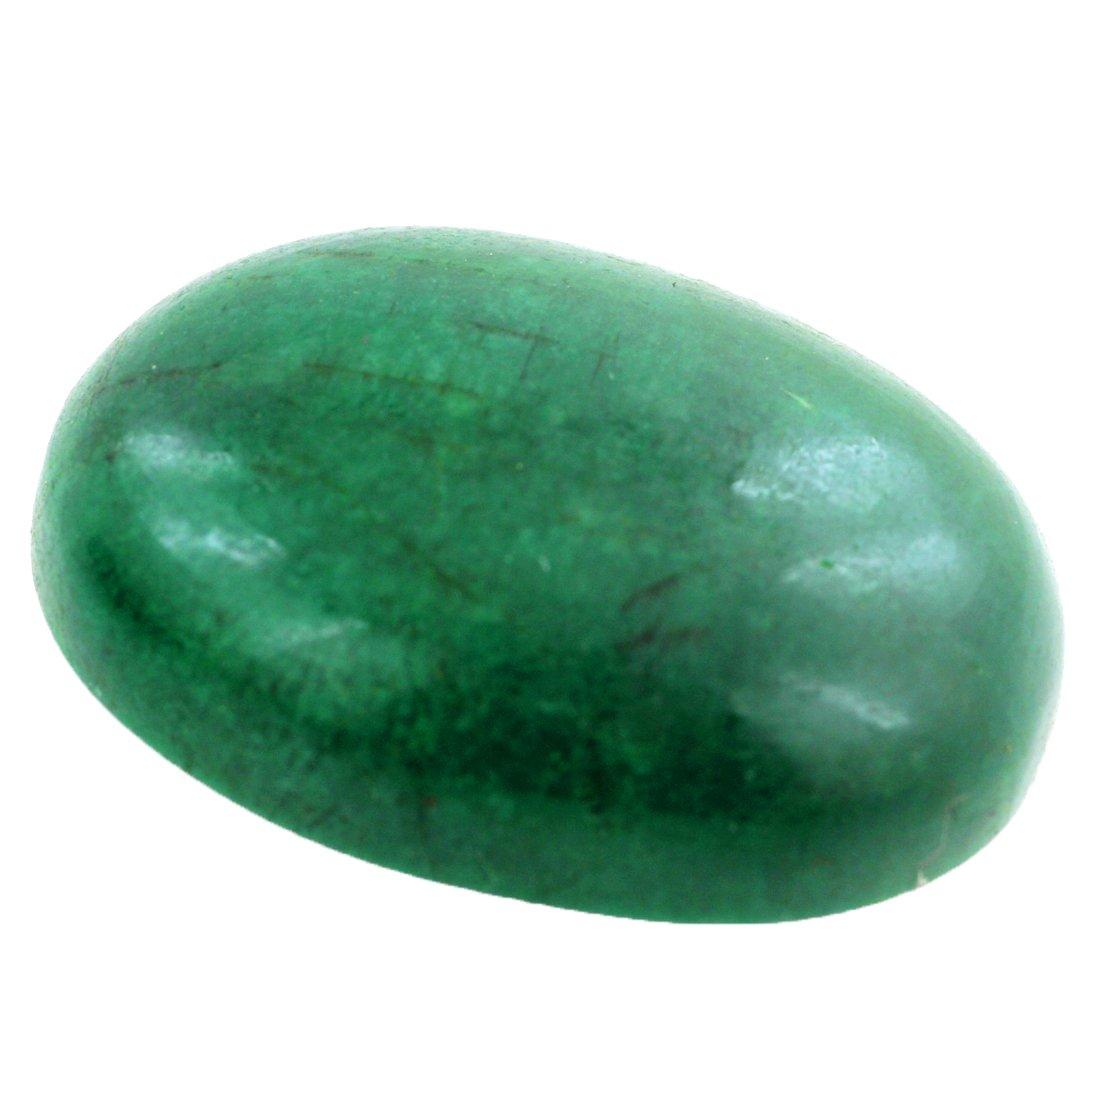 skyjewels Certified 46.60 Ct Oval Cabochon Emerald Gemstone Buy Online Sale